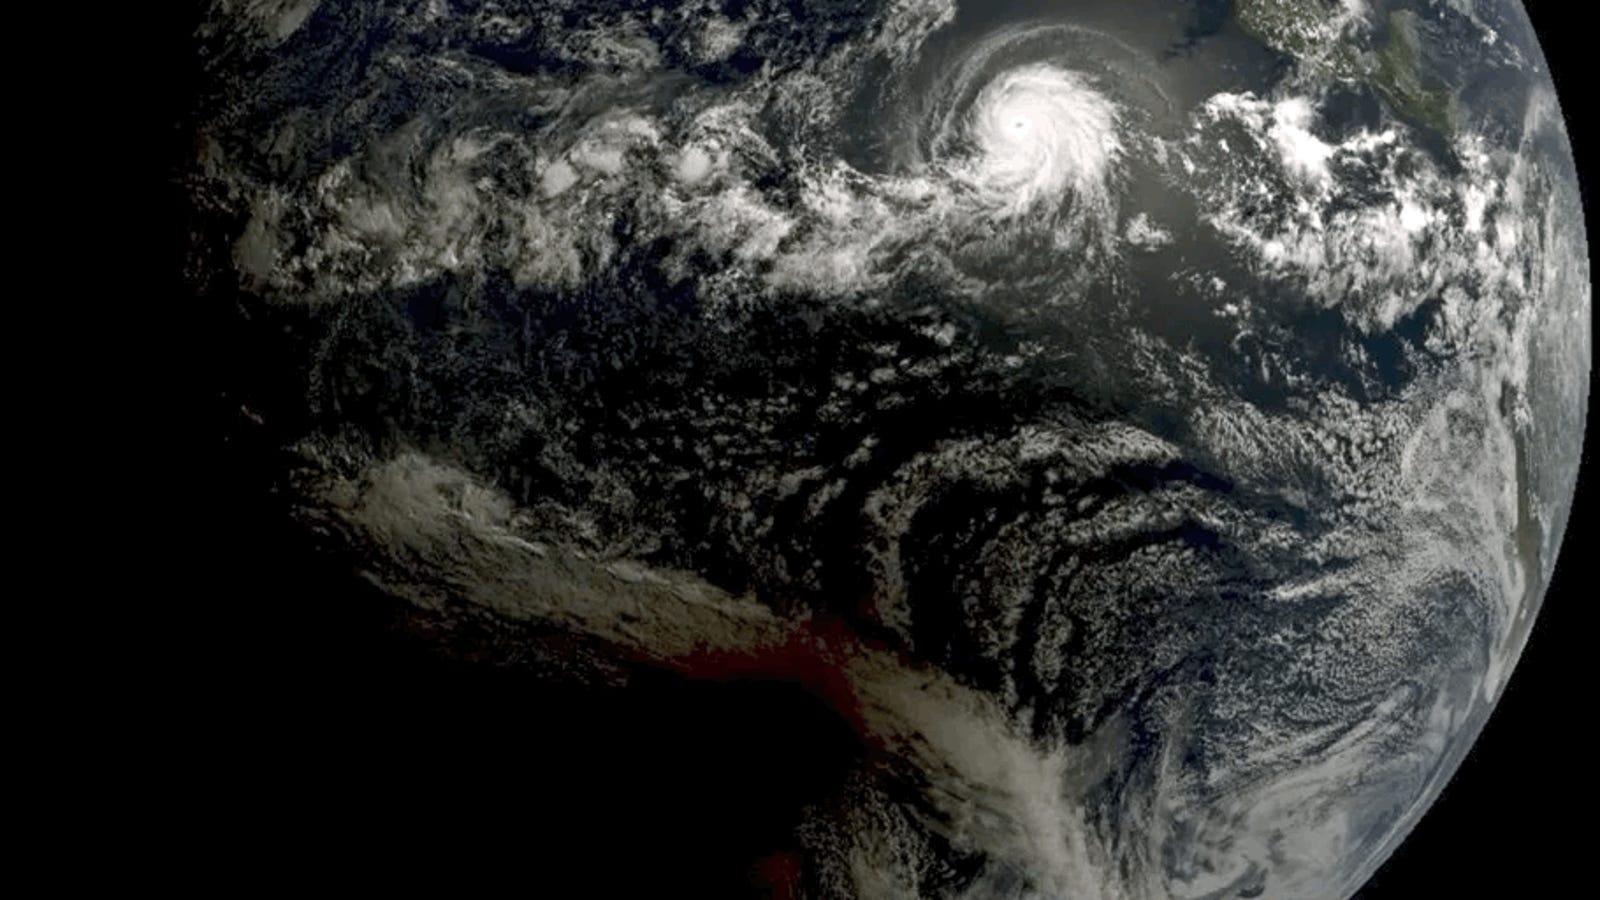 QnA VBage Eclipsecane! Solar Eclipse Photobombs Hurricane in Stunning Satellite Shots